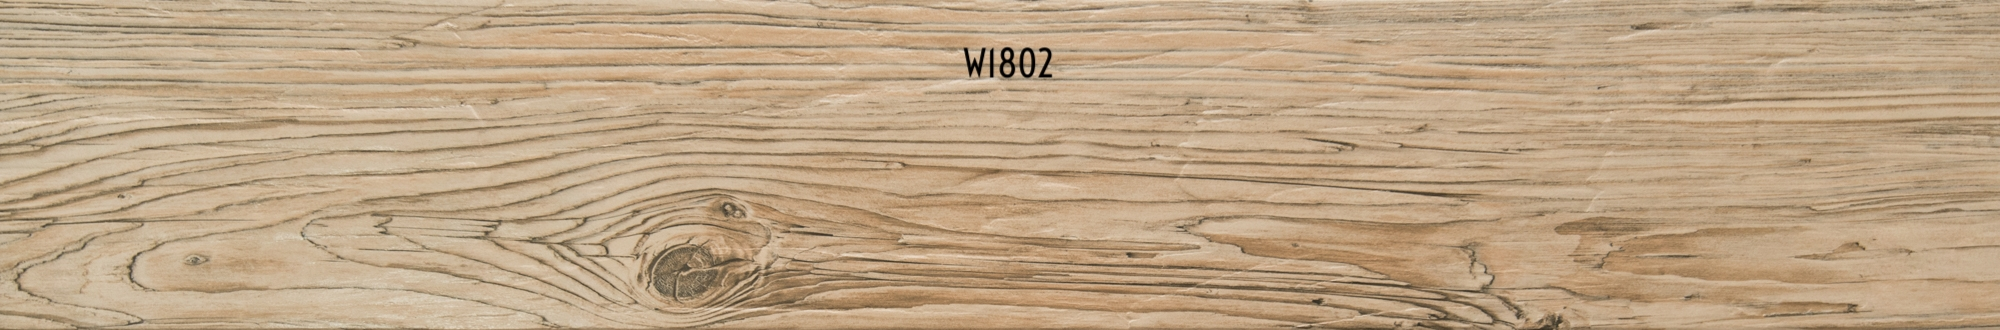 W1802